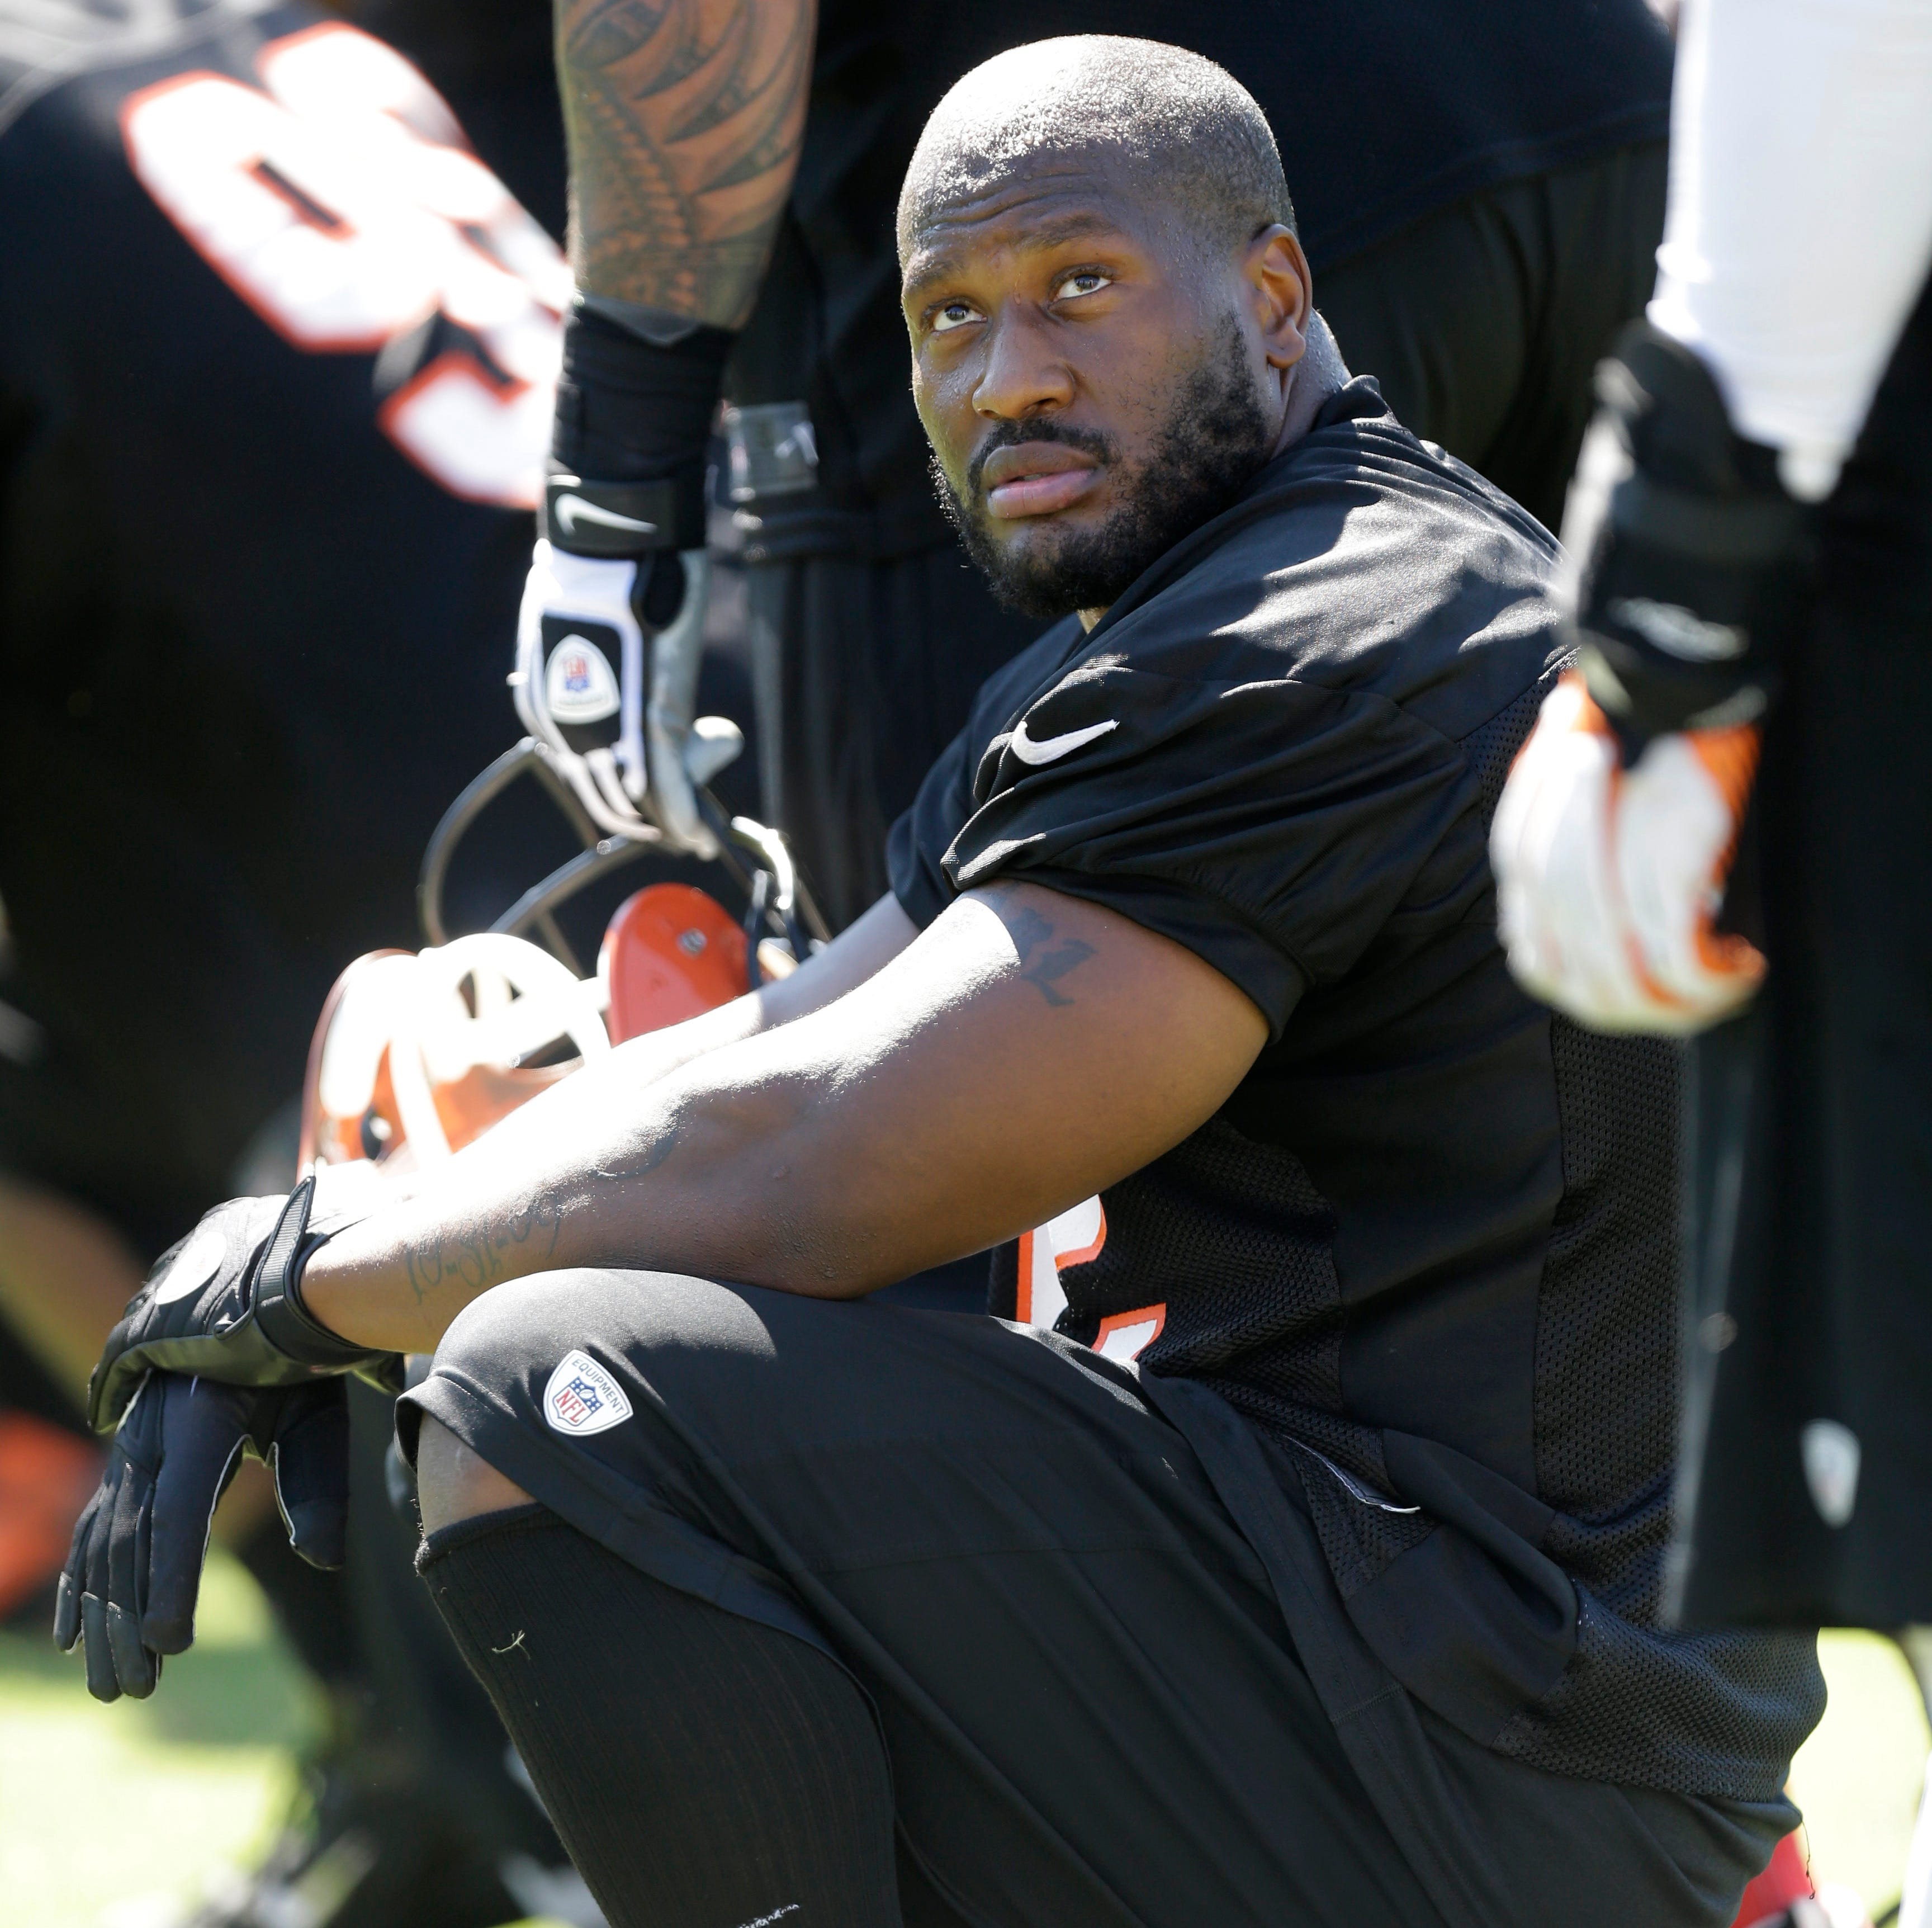 Cincinnati Bengals linebacker James Harrison takes a break during practice at the NFL football team's training camp, Thursday, July 25, 2013, in Cincinnati.